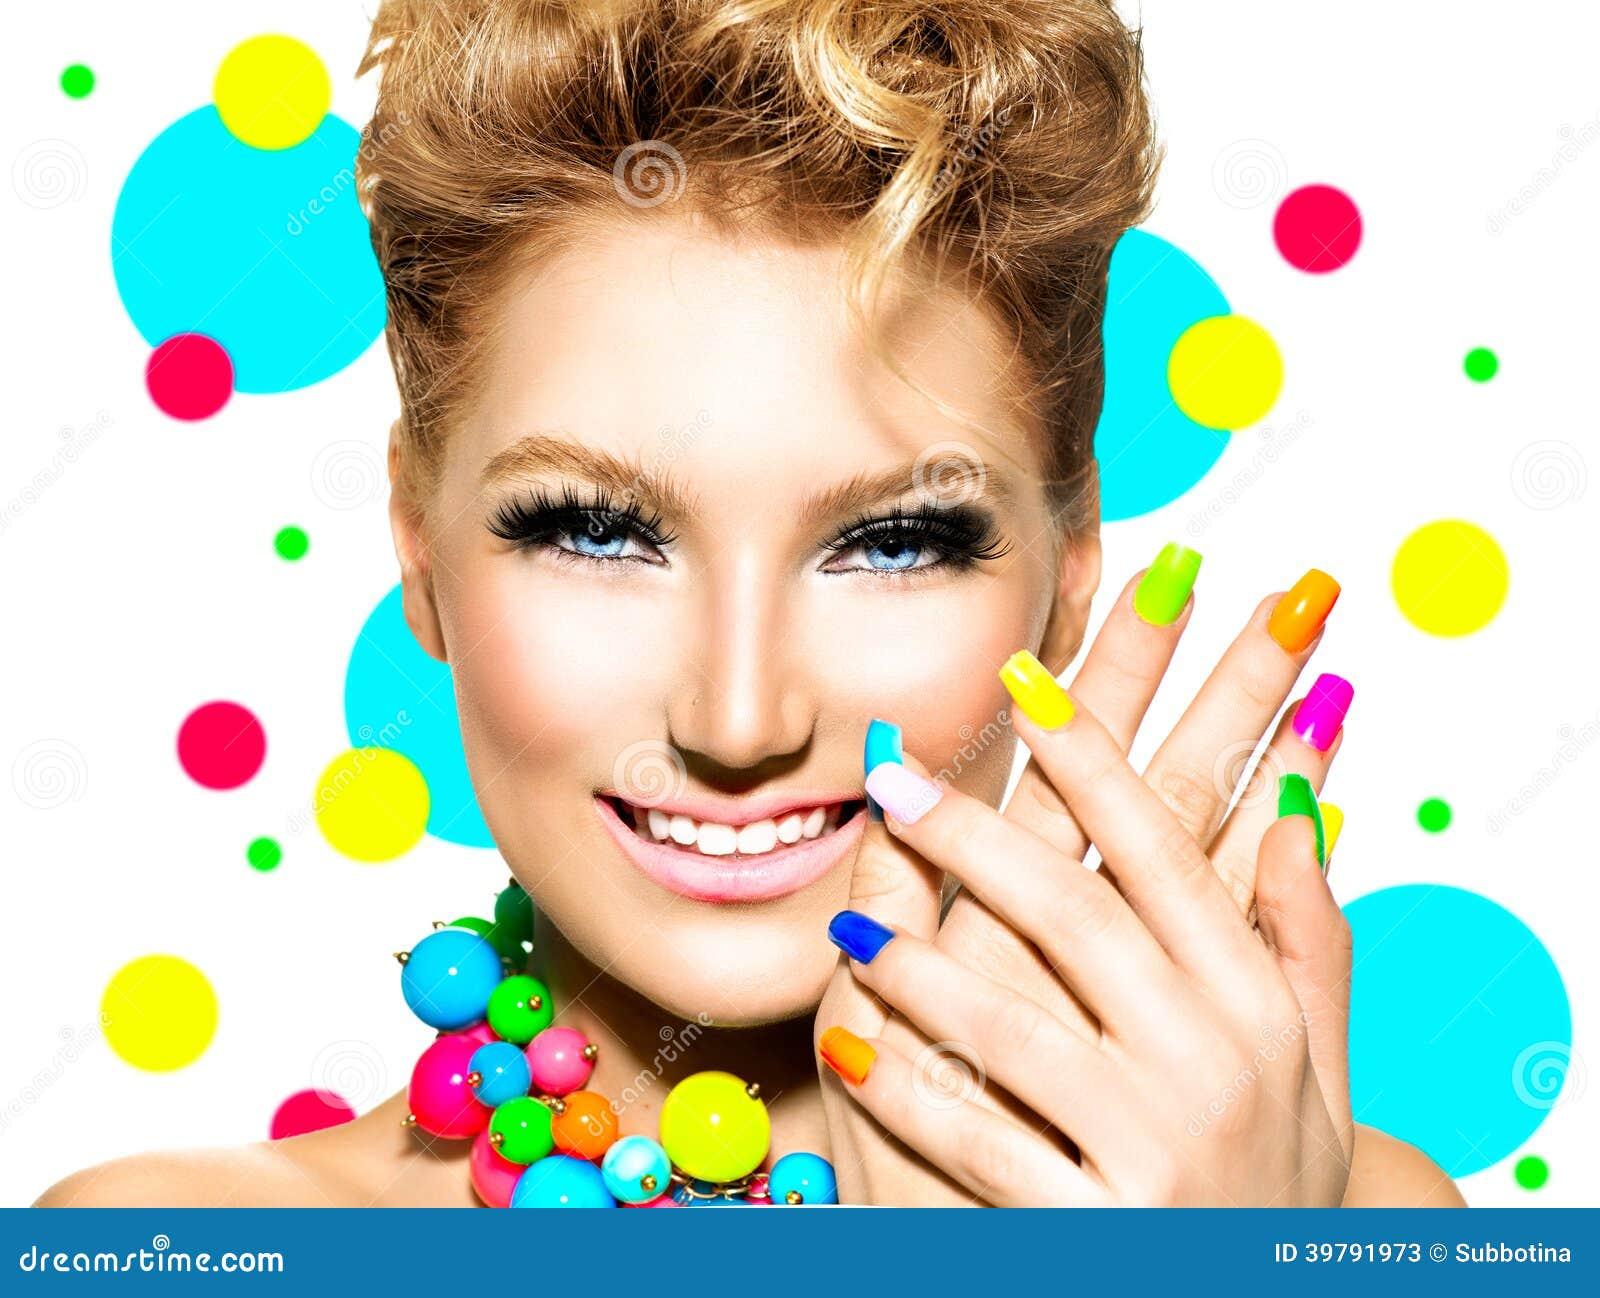 Beauty Girl with Colorful Makeup, Nail polish